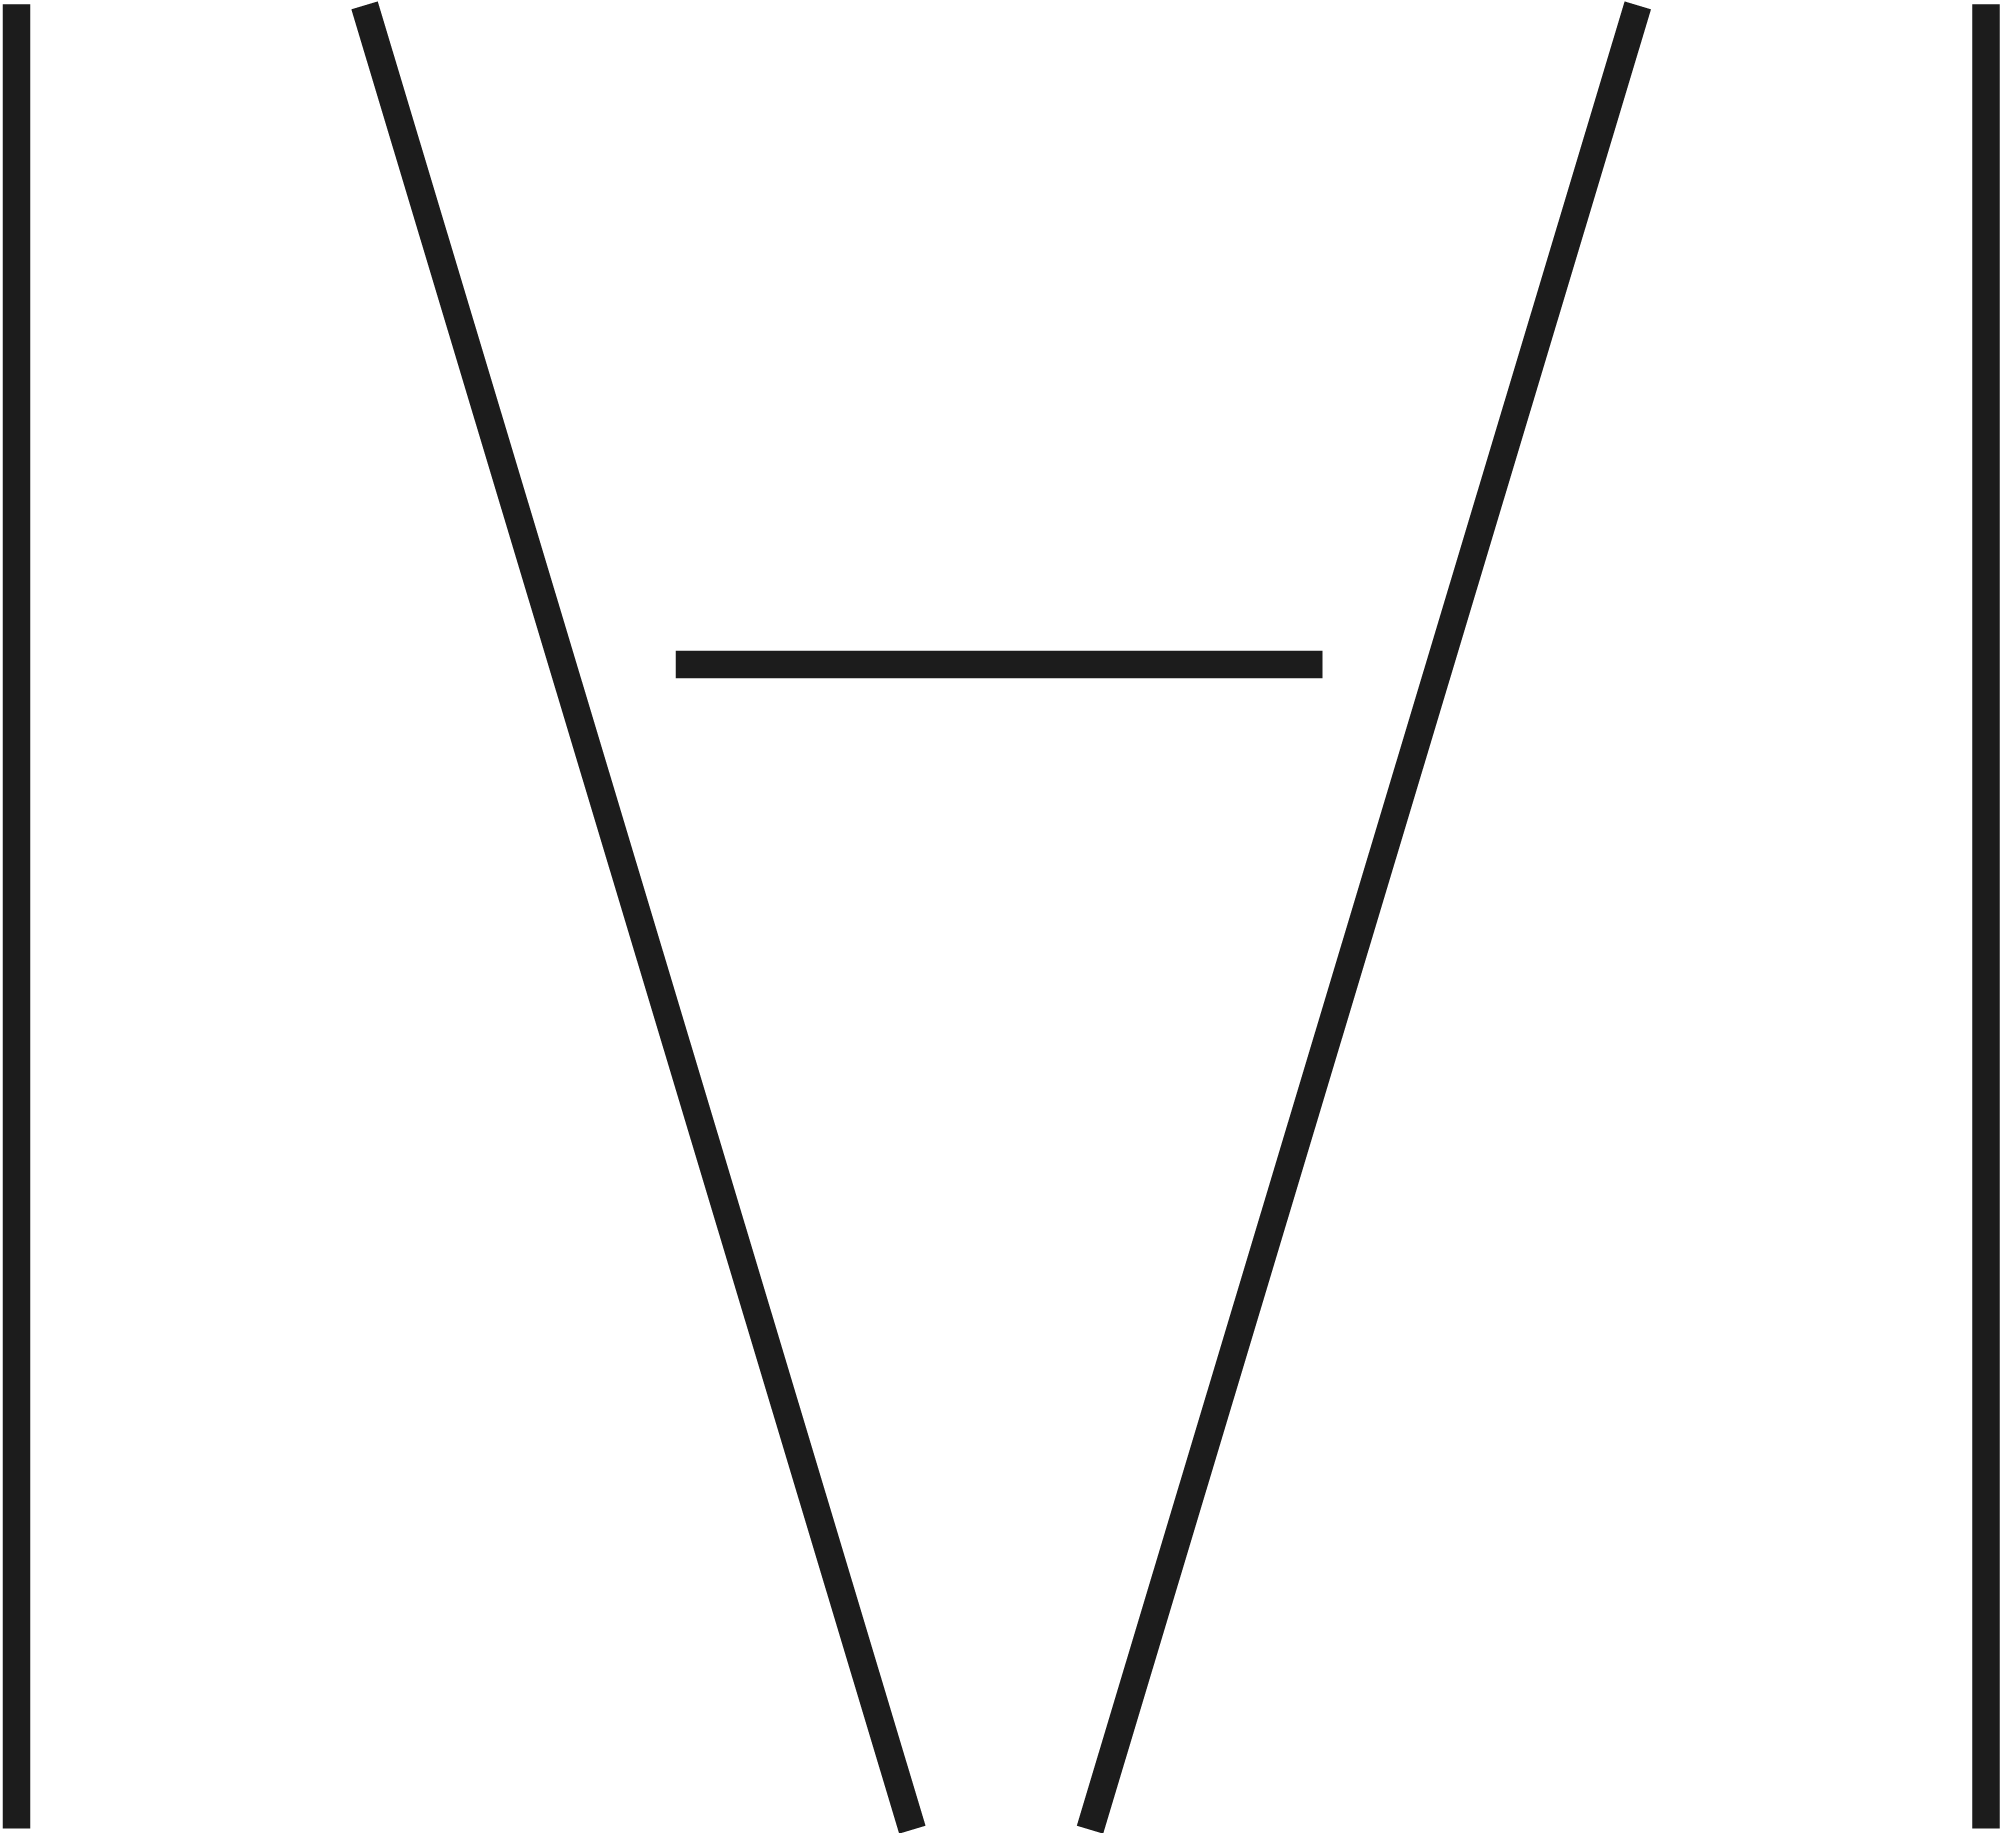 MEDAA-Monogram